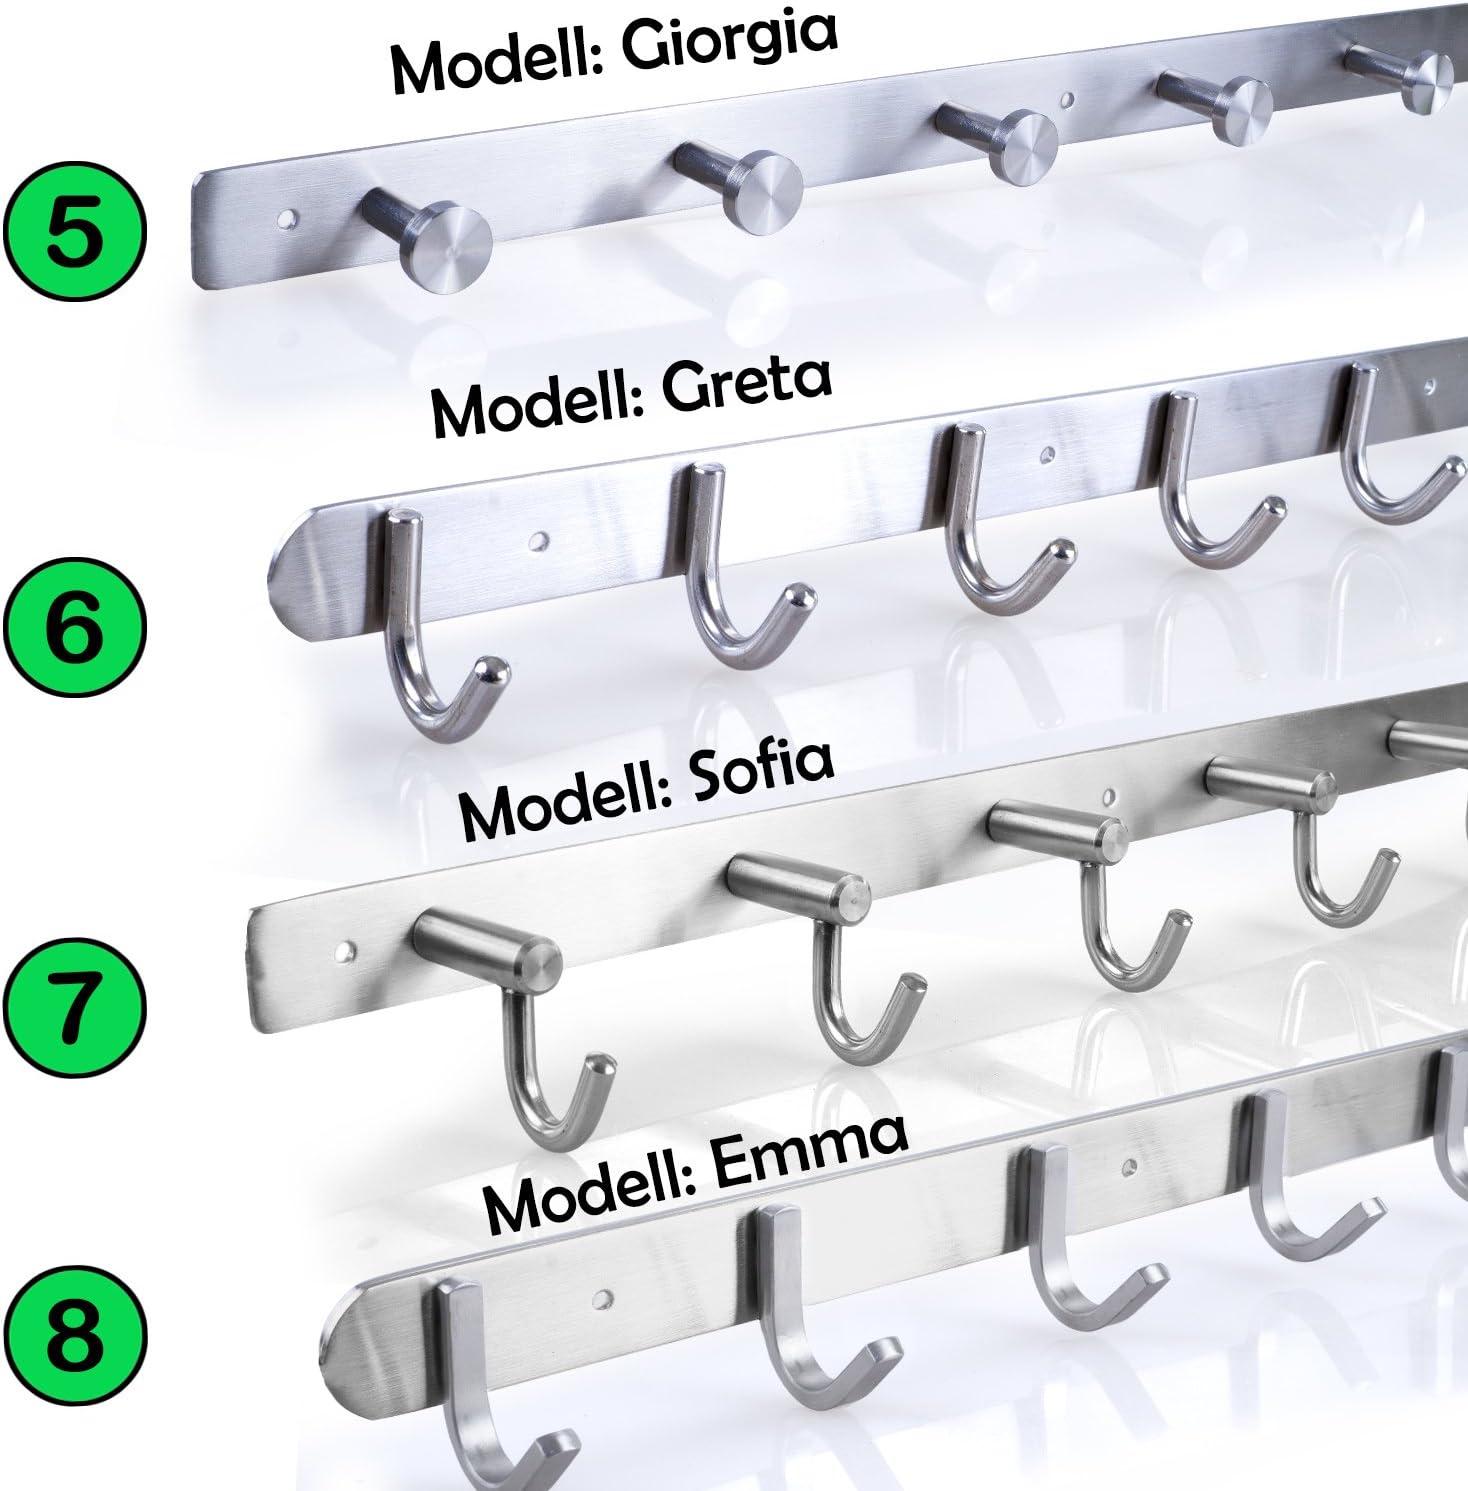 Hakenleiste Kleiderhaken EDELSTAHL geb/ürstet Garderobenleiste Garderobenhaken mit 1//4//6//8//10 Haken Wandhaken Wandgarderobe Modell:GRETA L/änge w/ählbar: 1 Haken L: 80mm